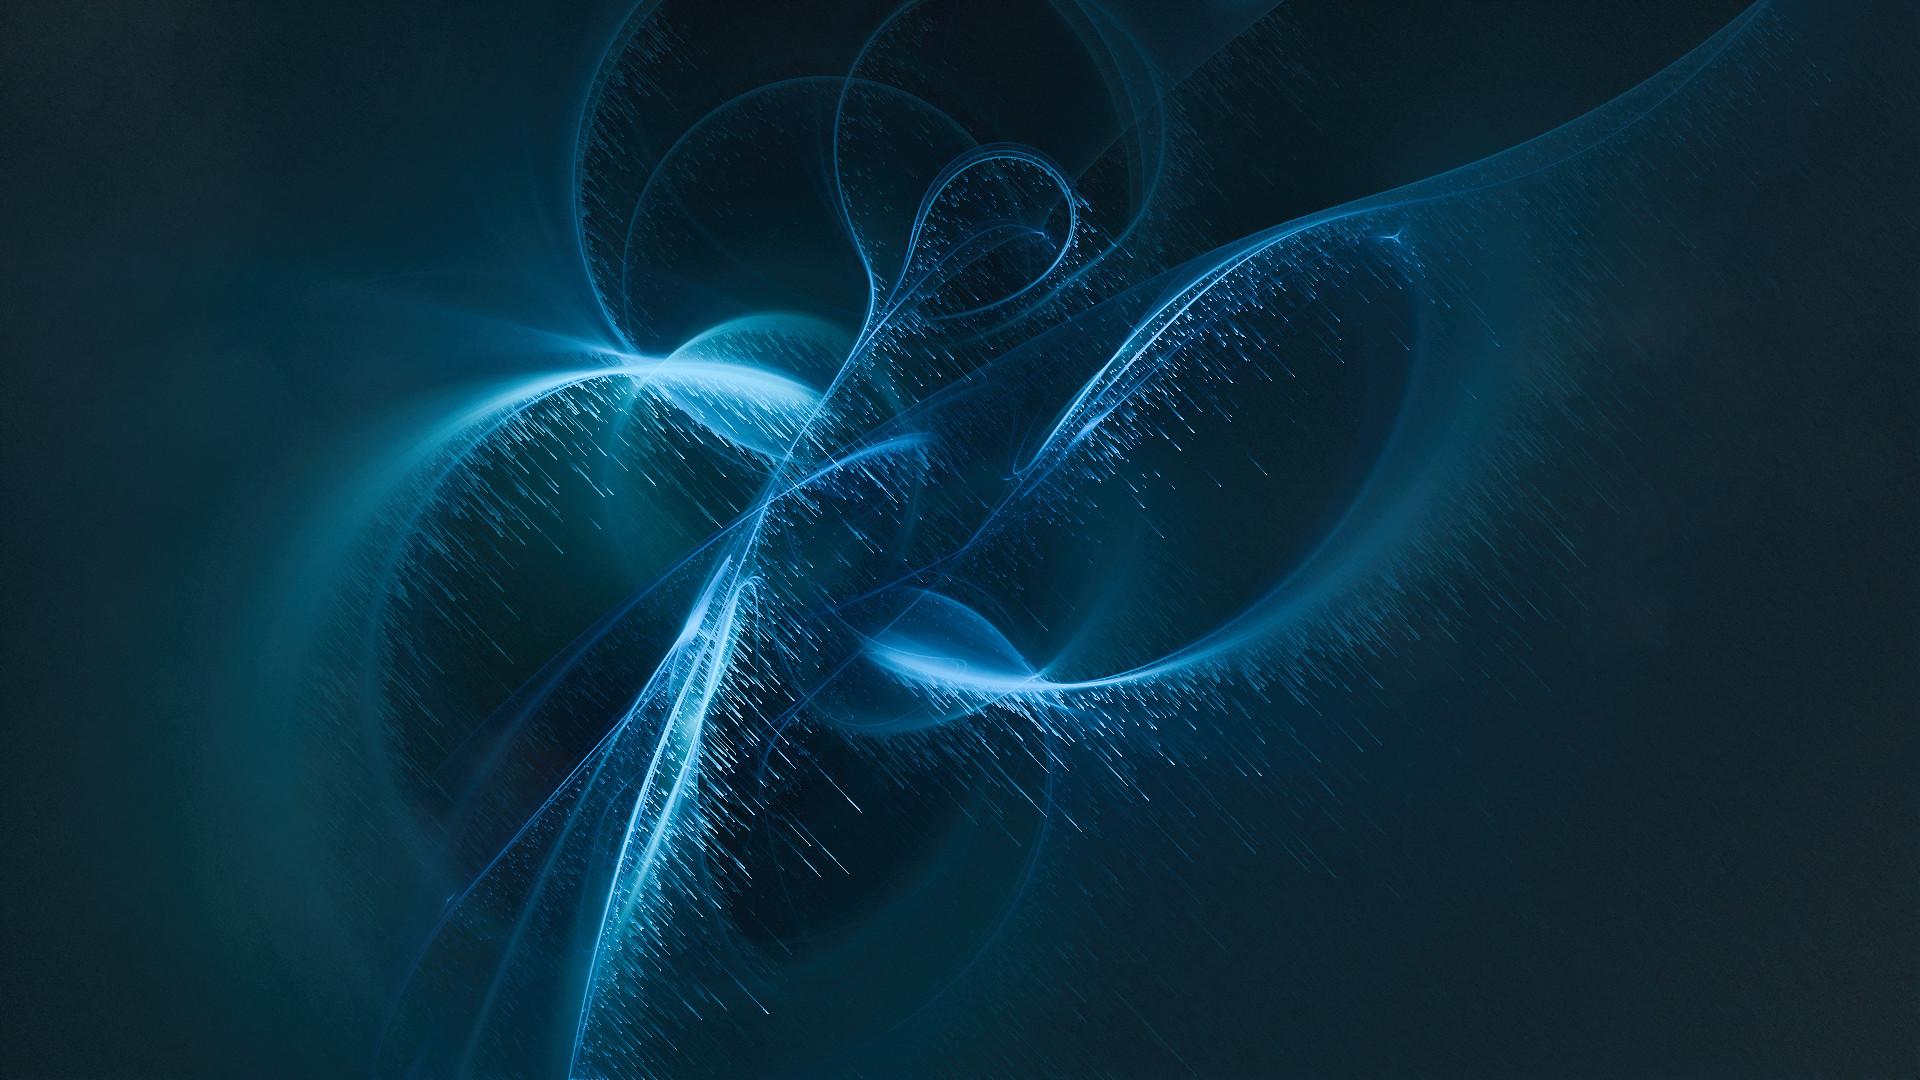 Kresimir jelusic robob3ar fractal rain 2